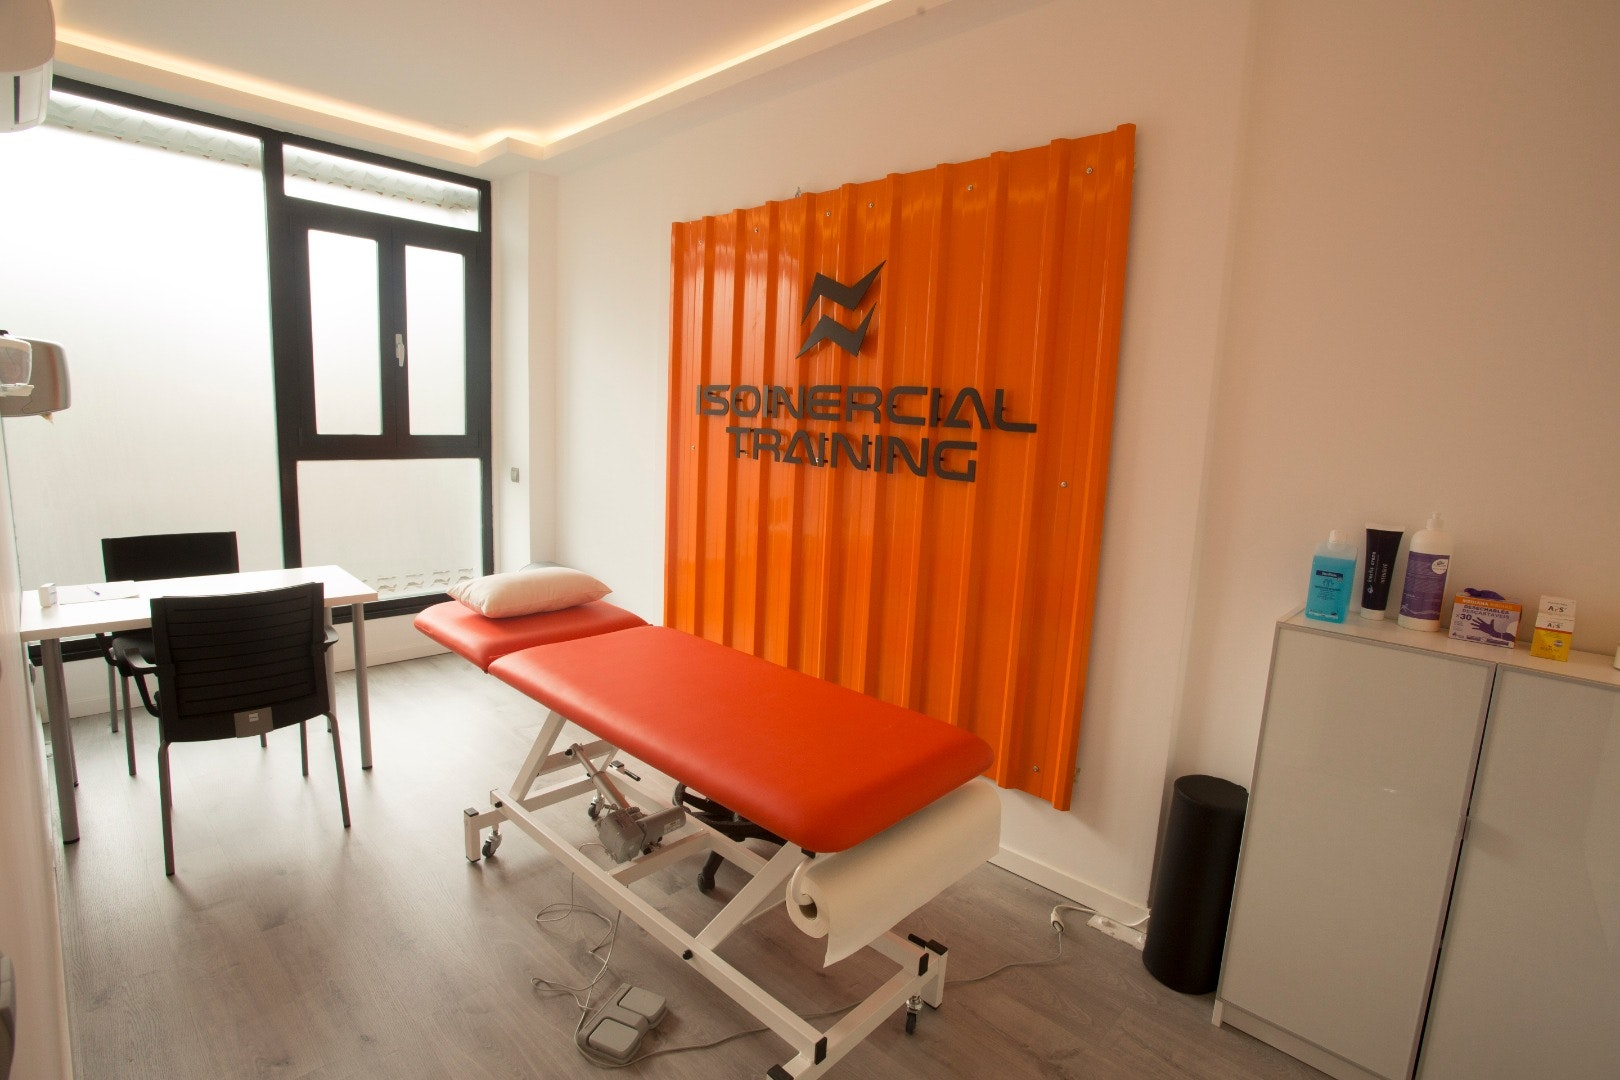 Isoinercial Training - Fisio